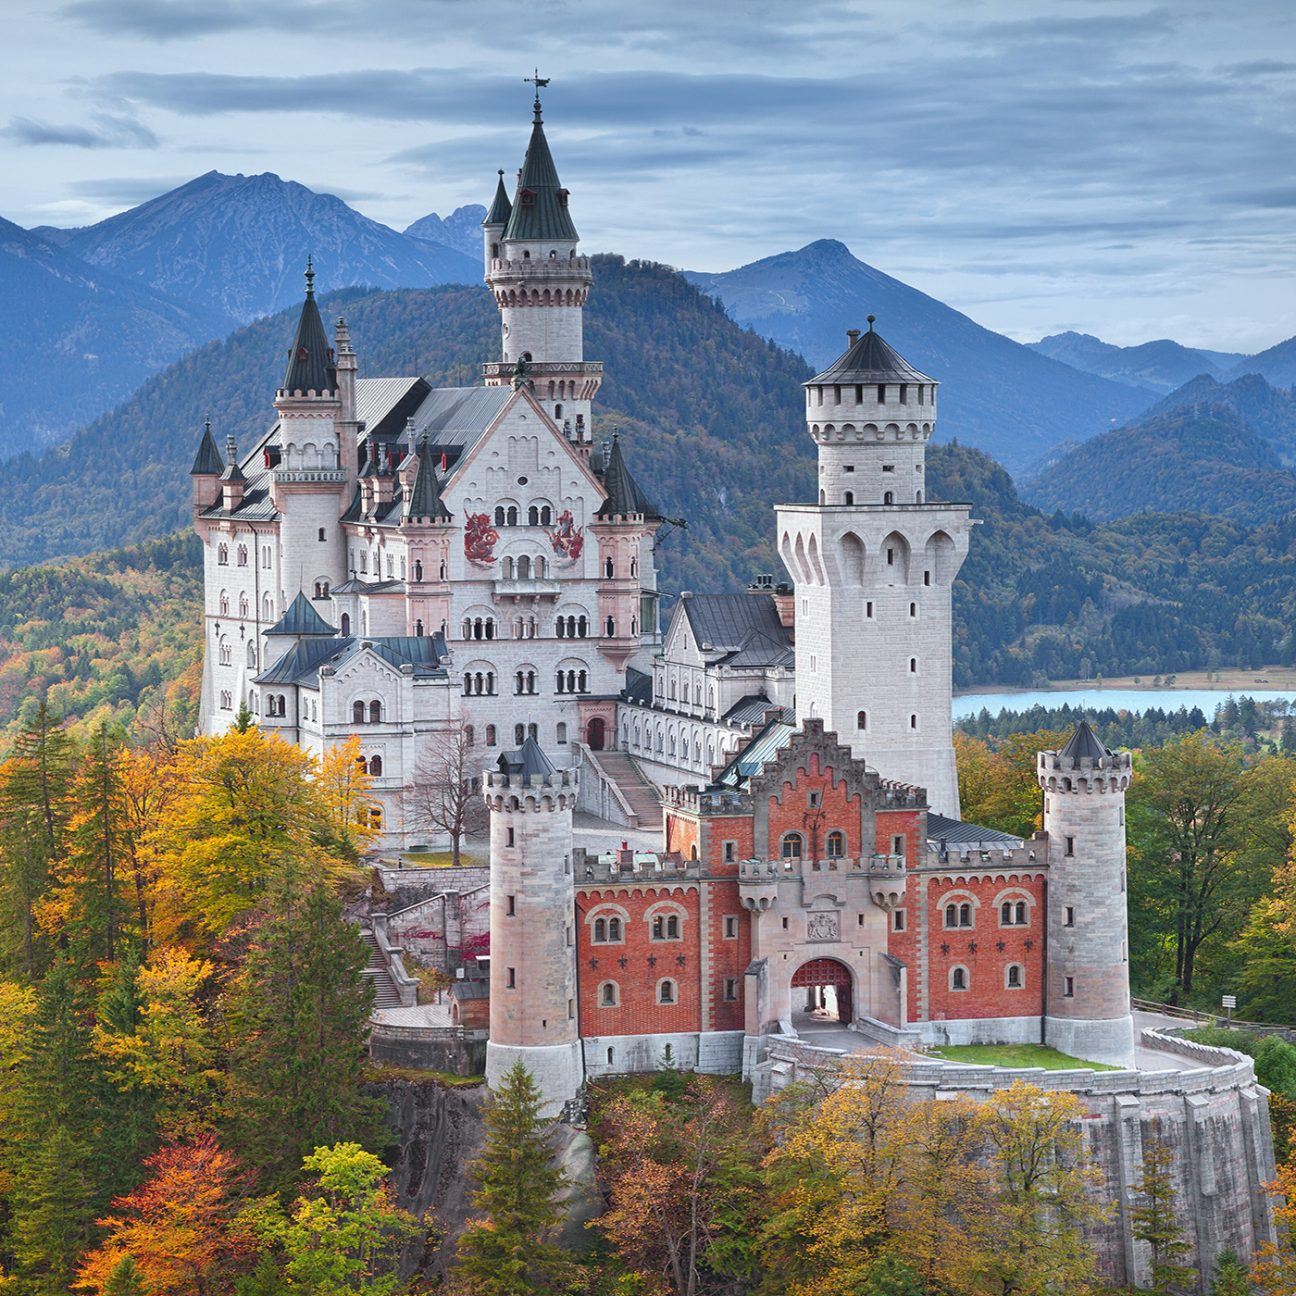 Castle in Bavaria, Germany